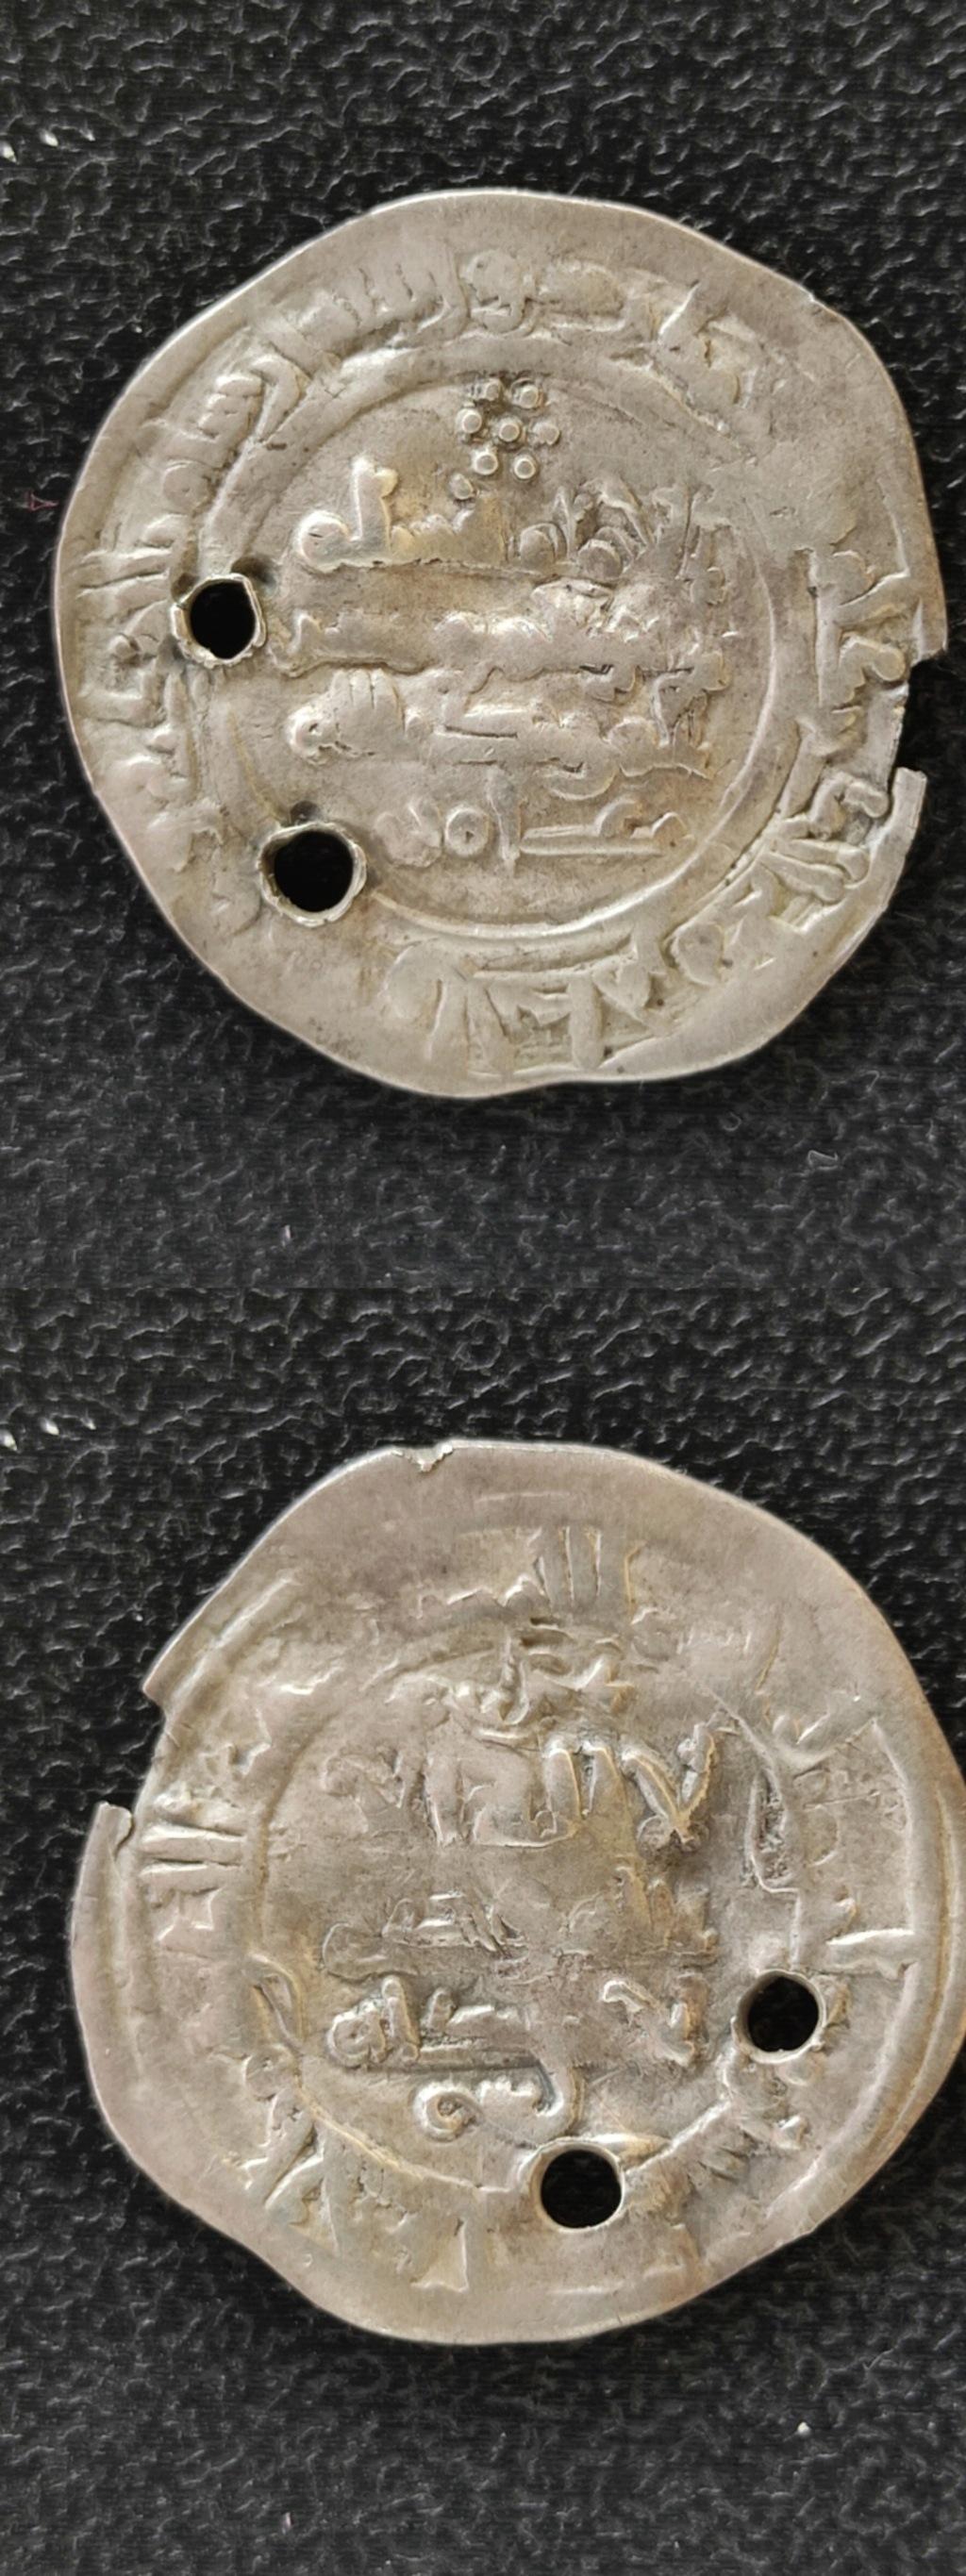 Dírham de Hixam II, al-Ándalus, 377 H Img_2036